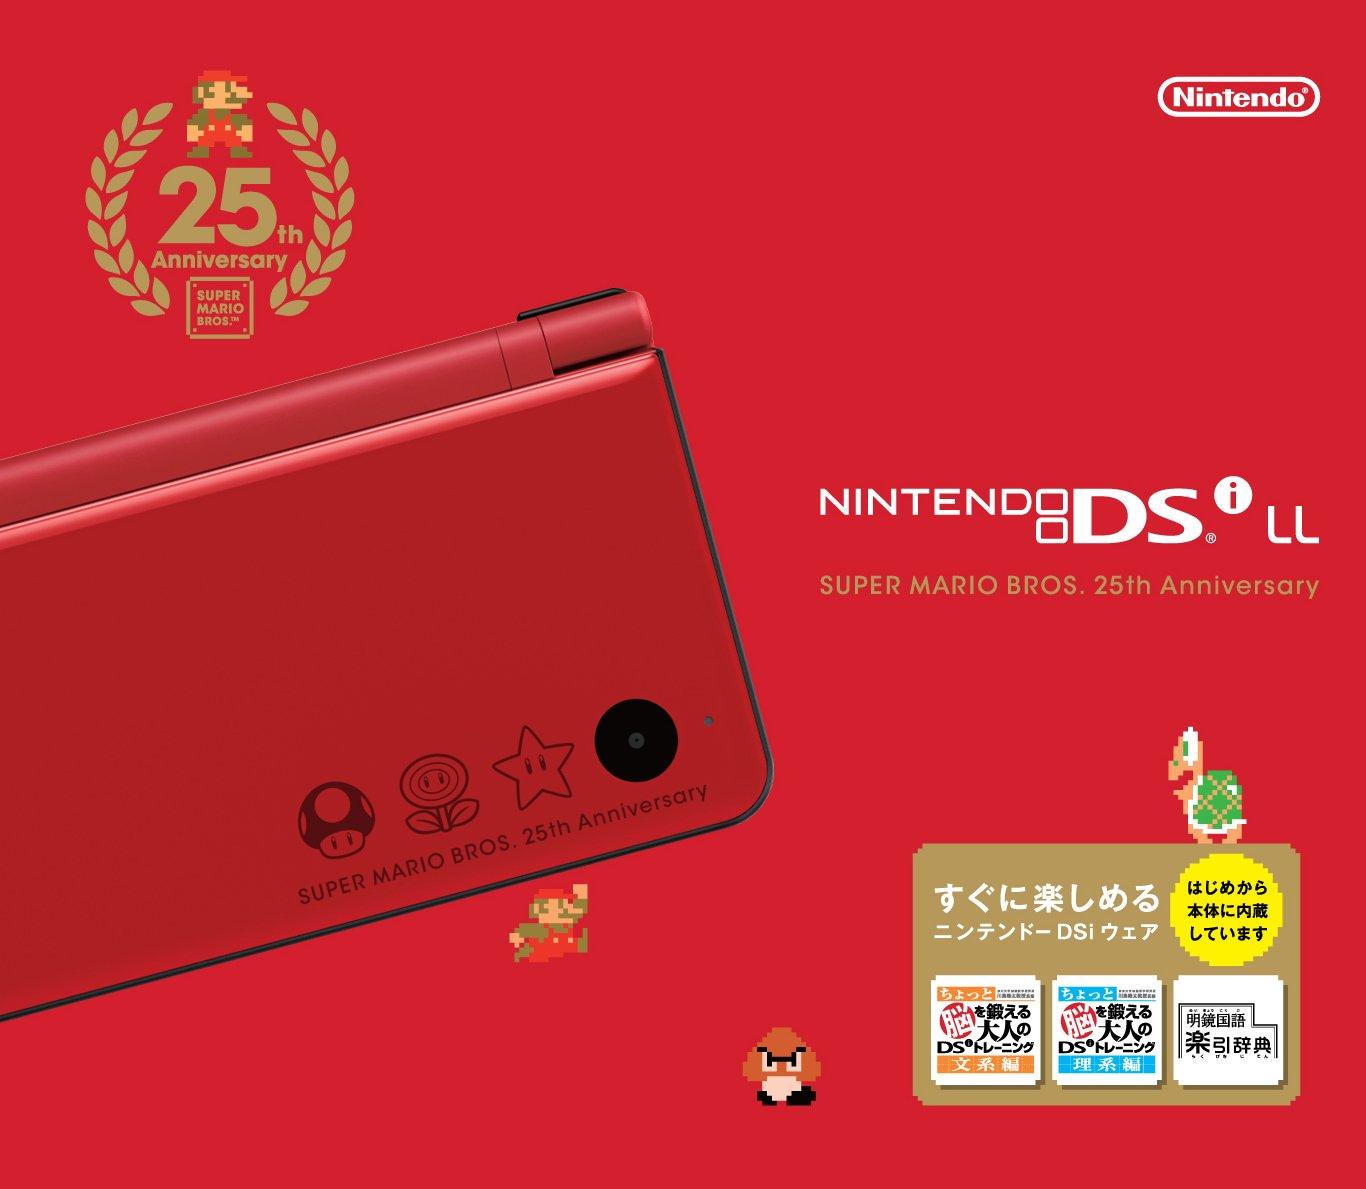 Specification (25th Anniversary Super Mario) Nintendo DSi LL by